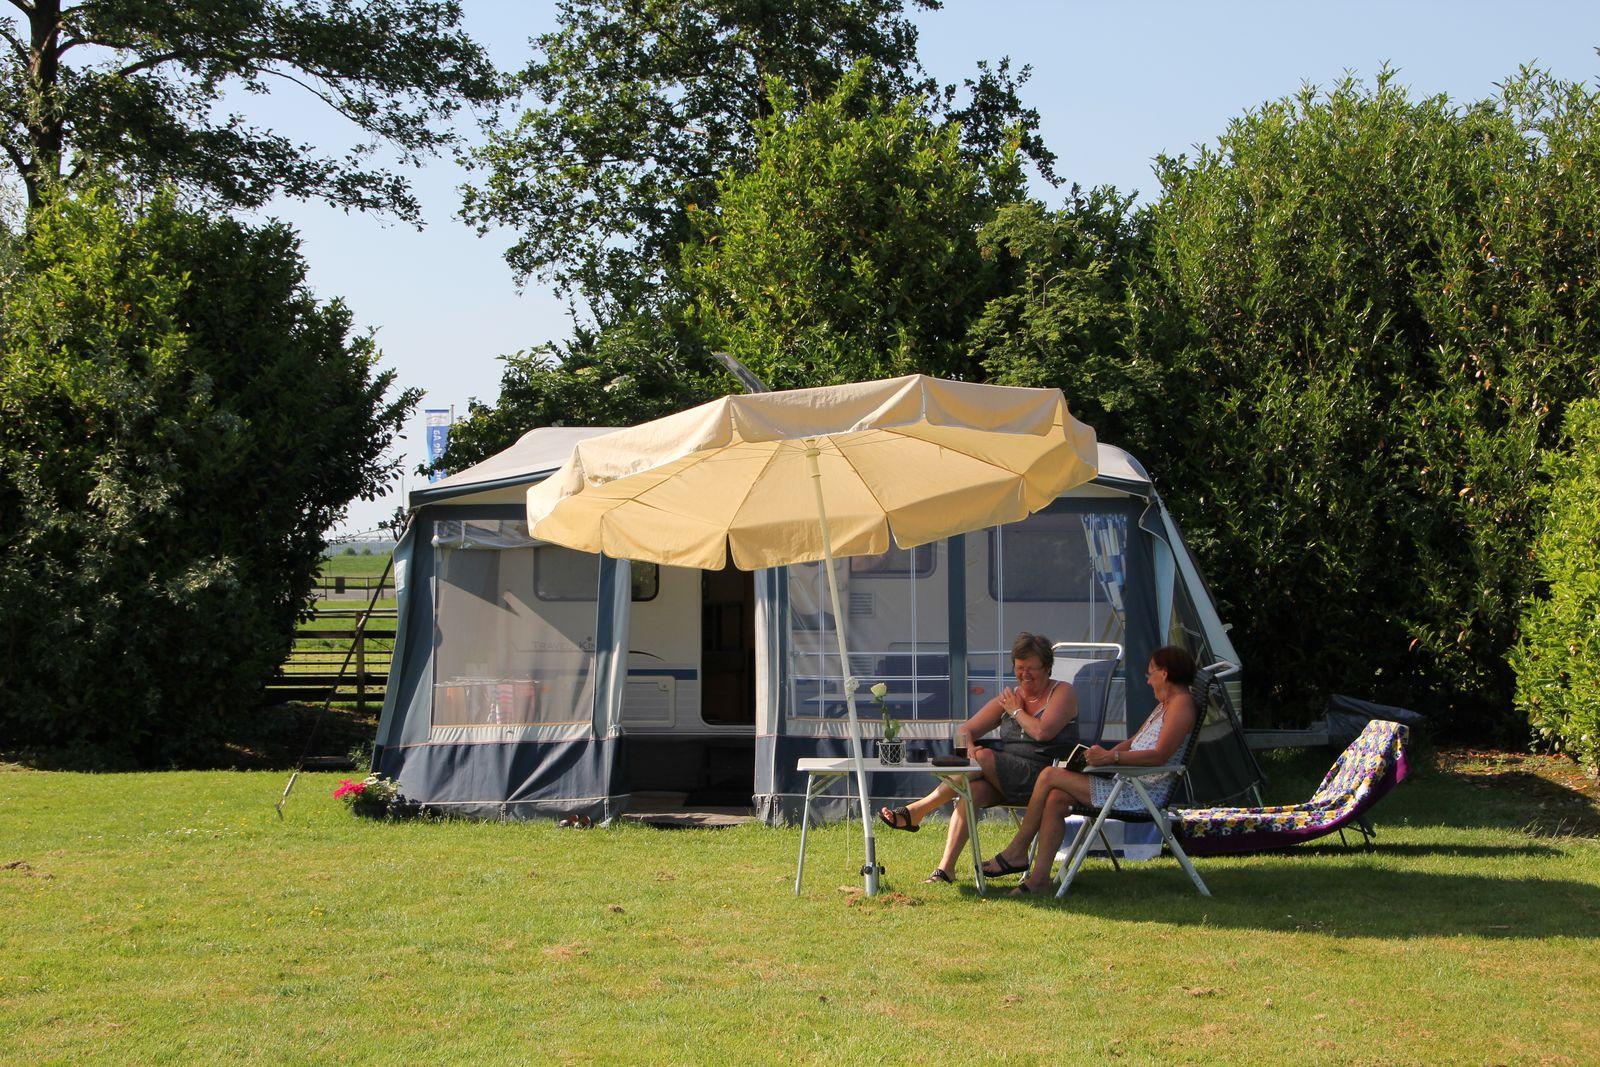 Afbeelding van Kampeerplaats Caravan of Tent, 4A